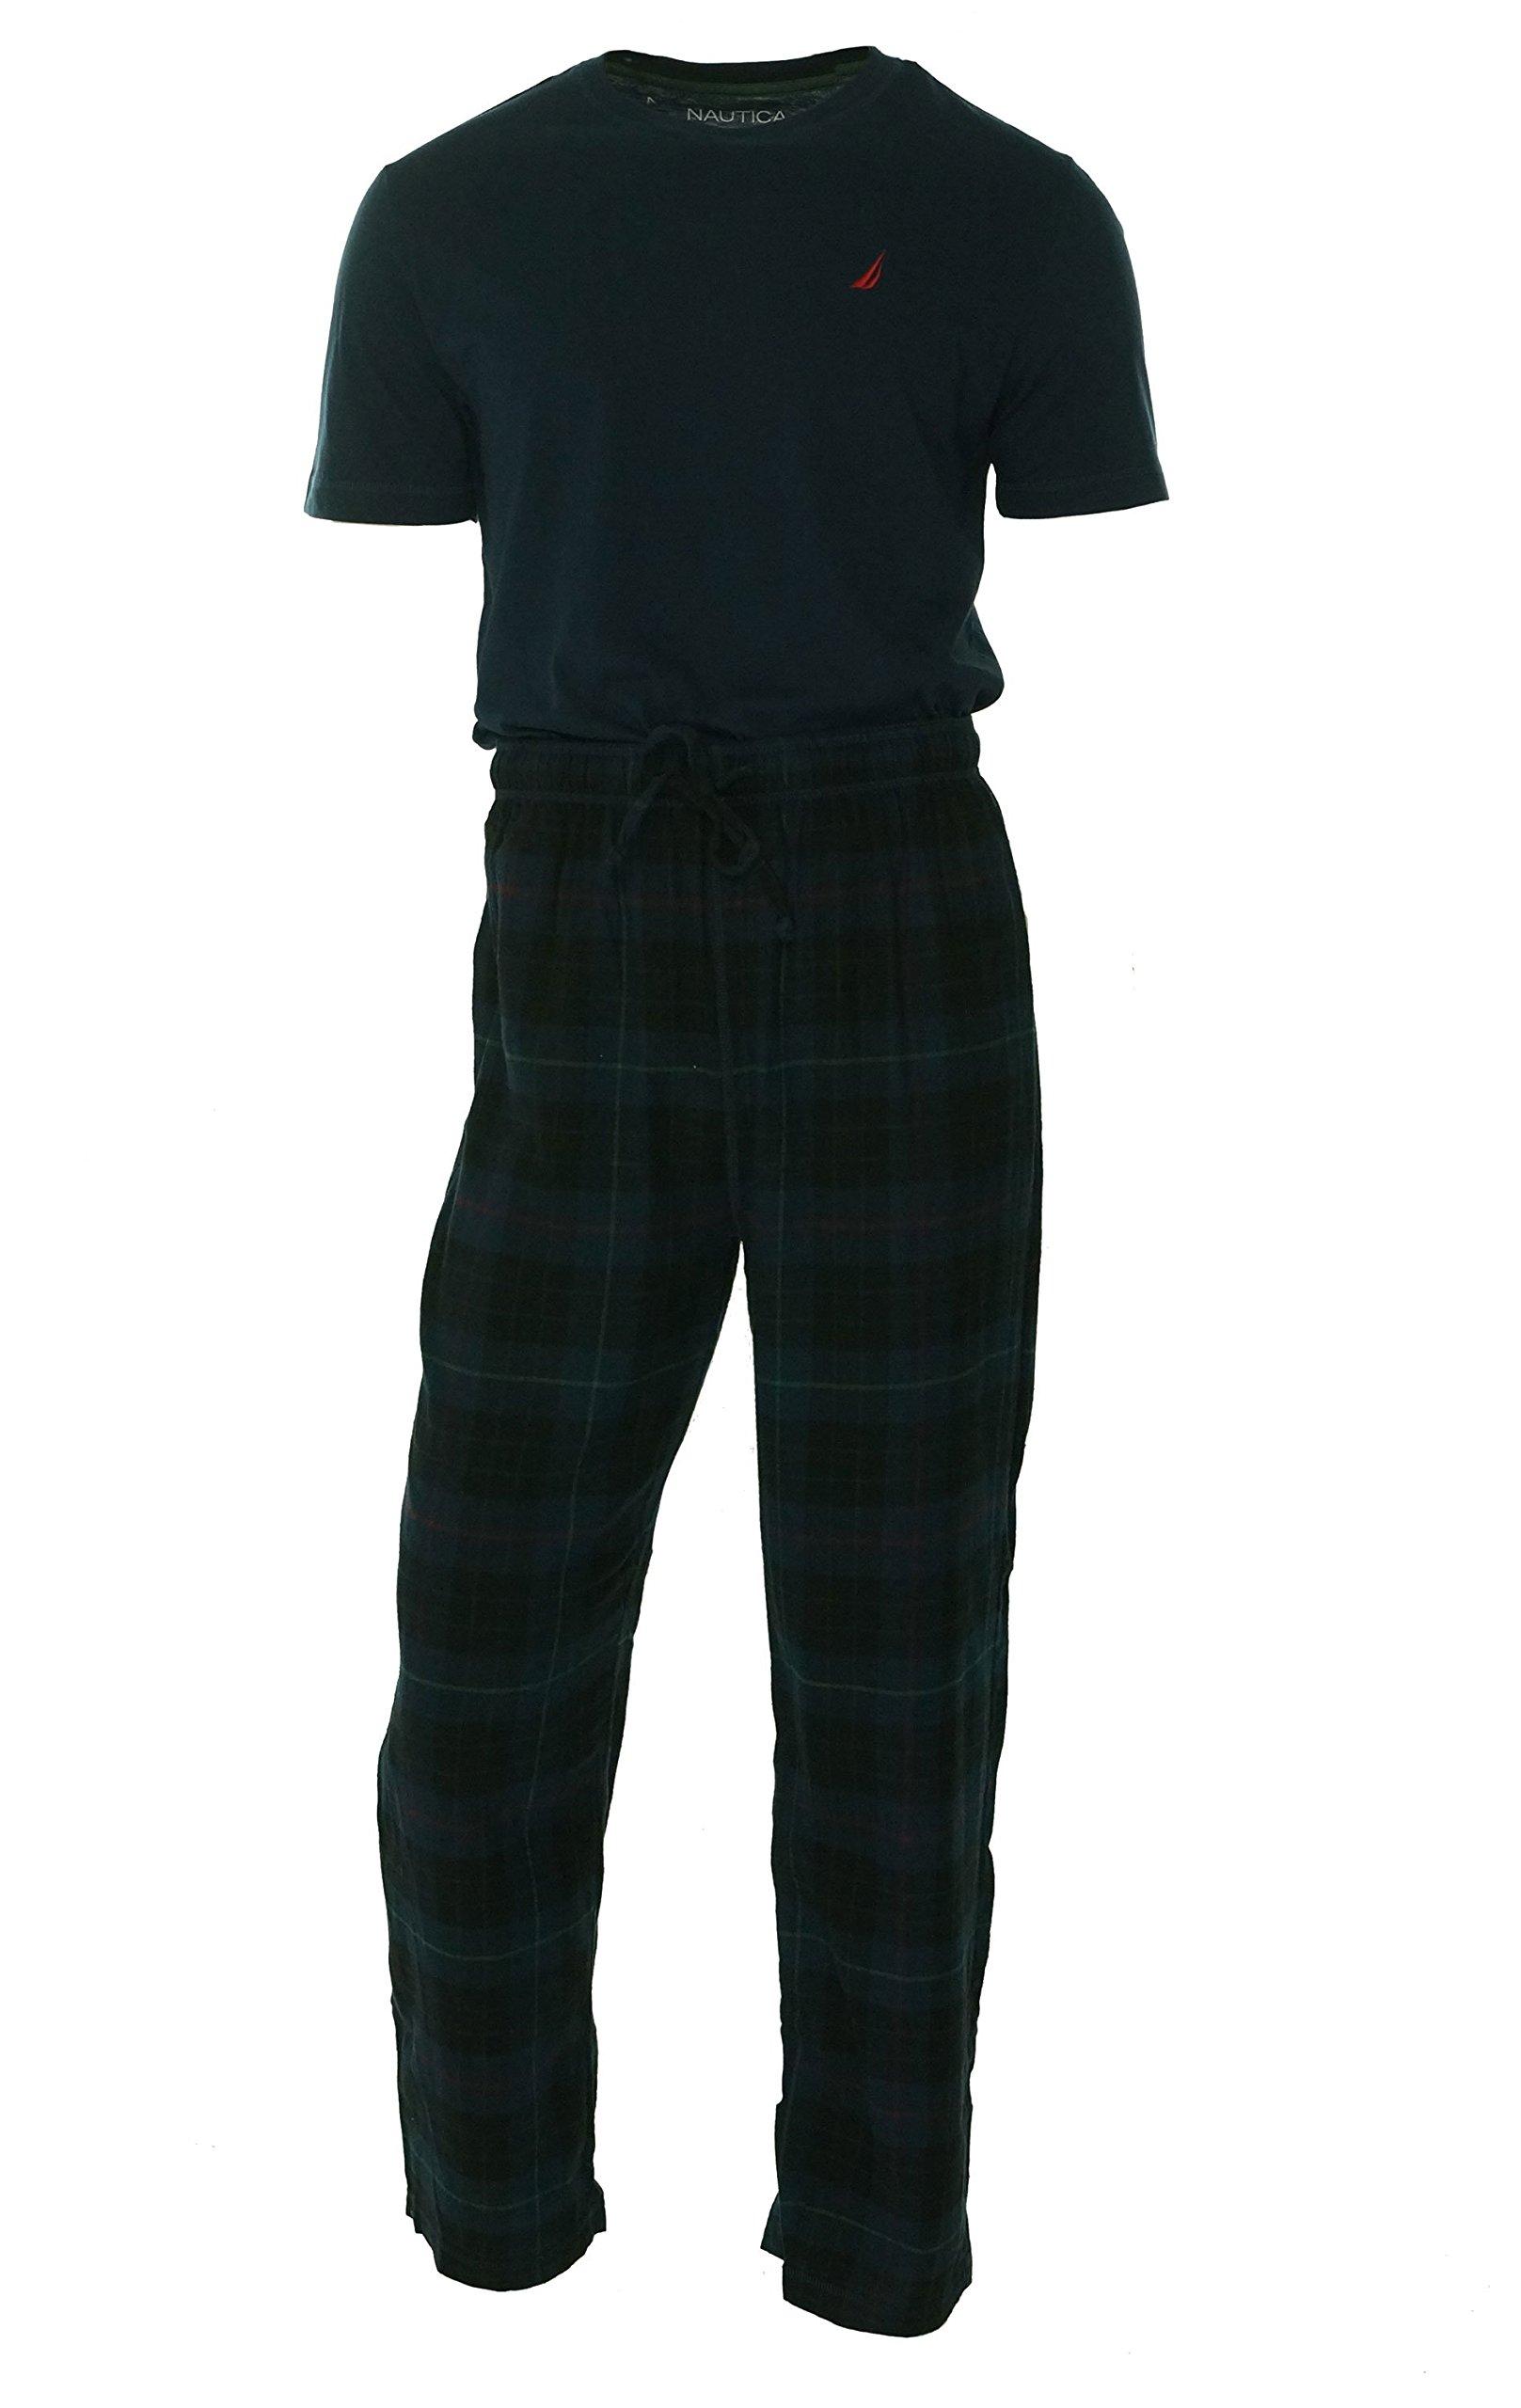 Nautica Men's Pajama Set with Tee Shirt and Tartan Plaid Pant (Small, Maritime Navy)